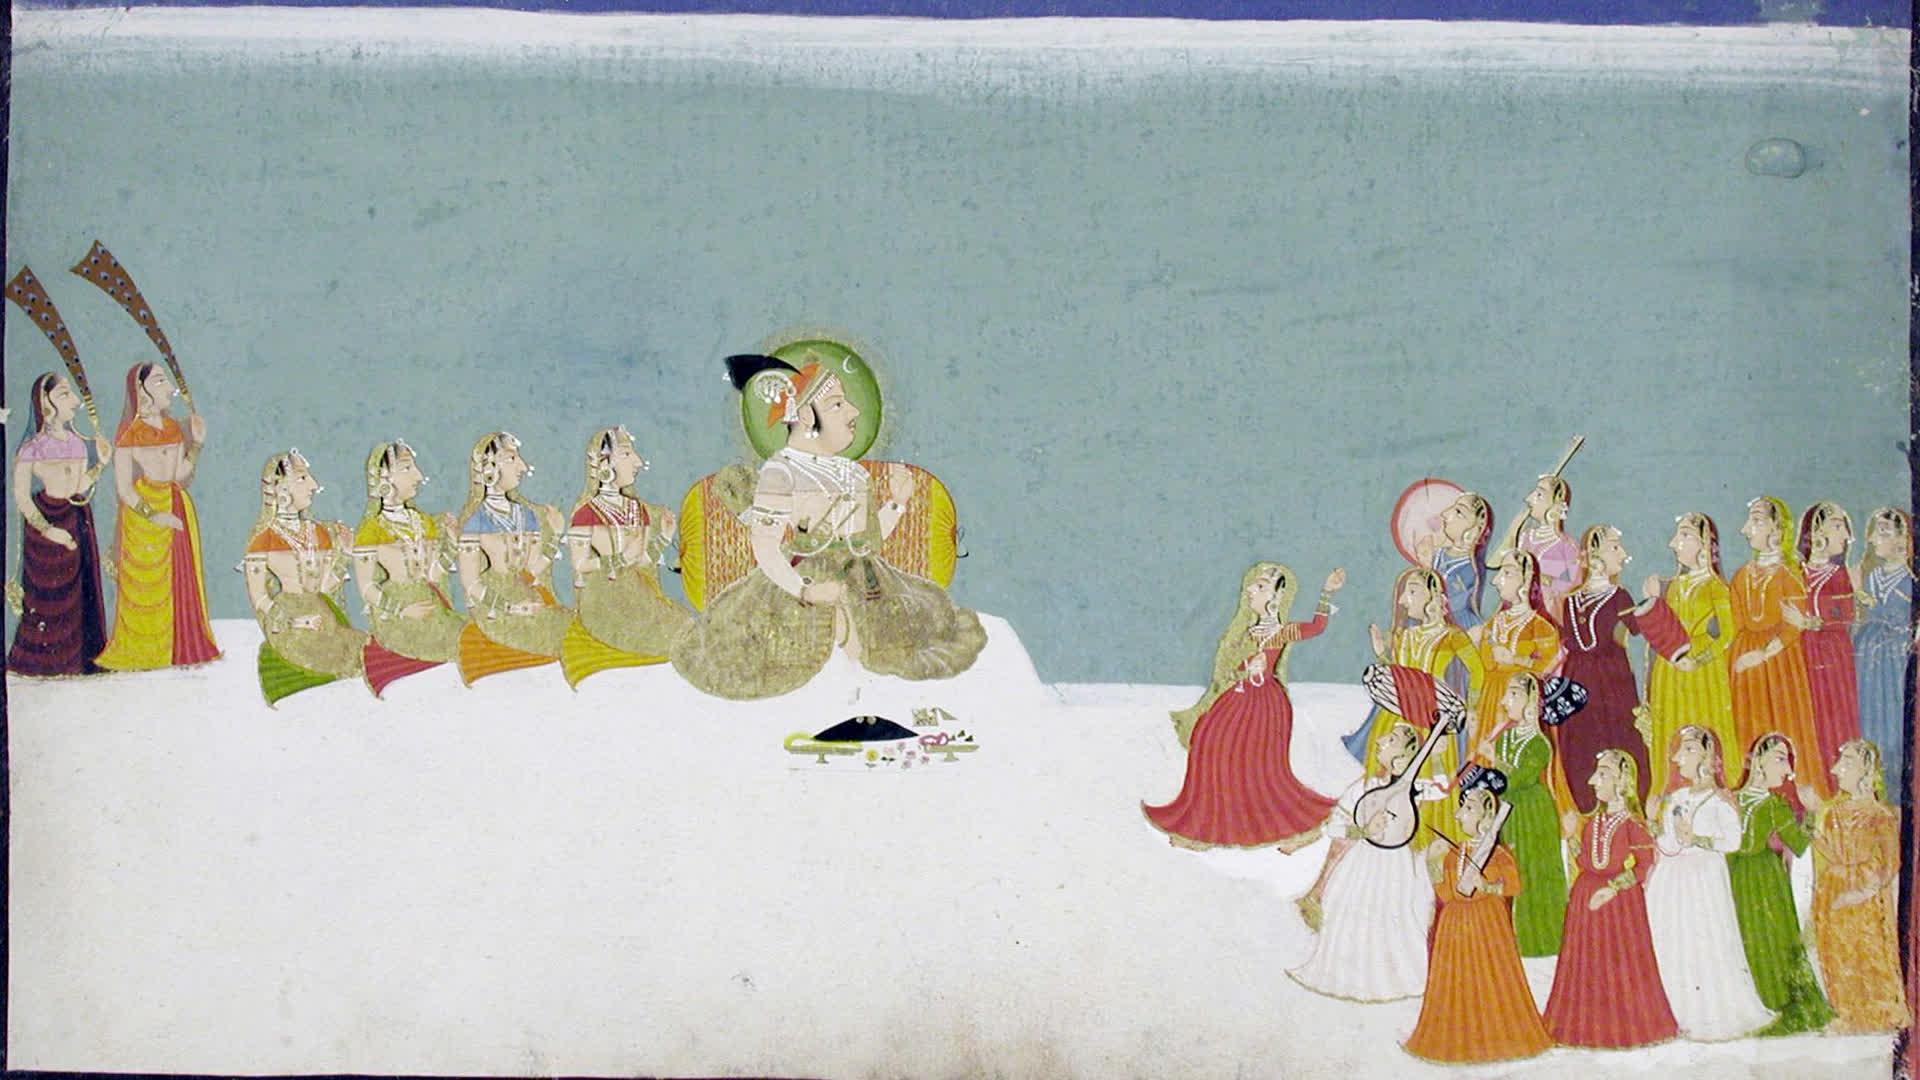 The Living Art of Mewar